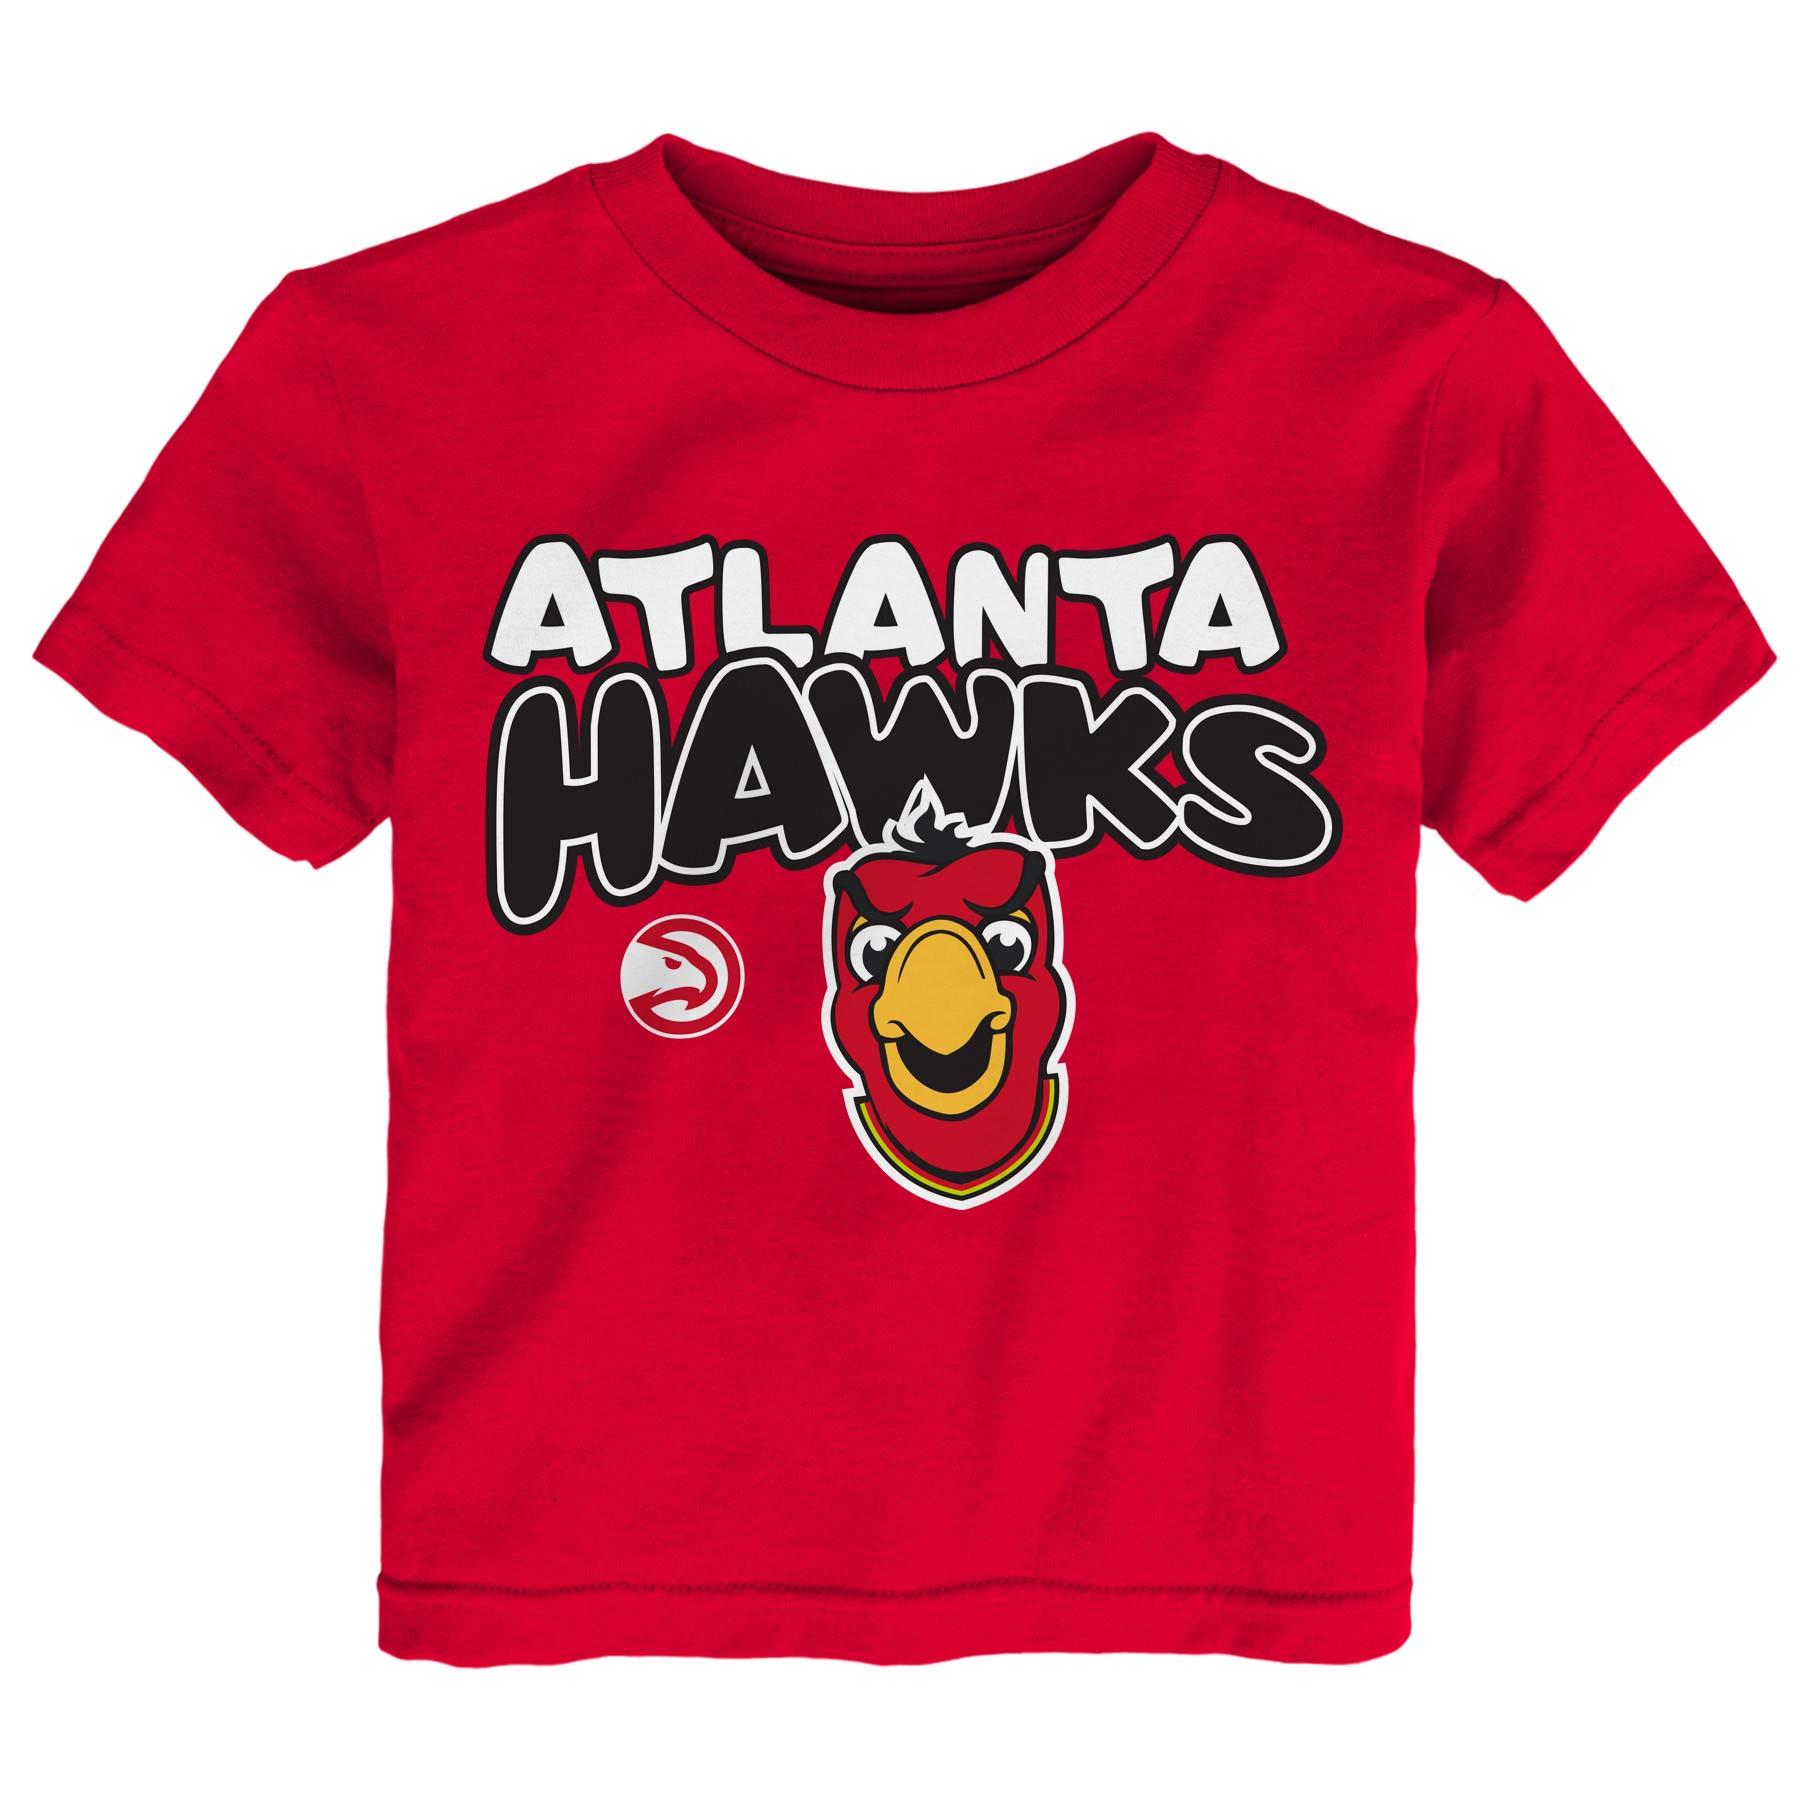 Atlanta Hawks Preschool & Toddler Bubble Letter T-Shirt - Red